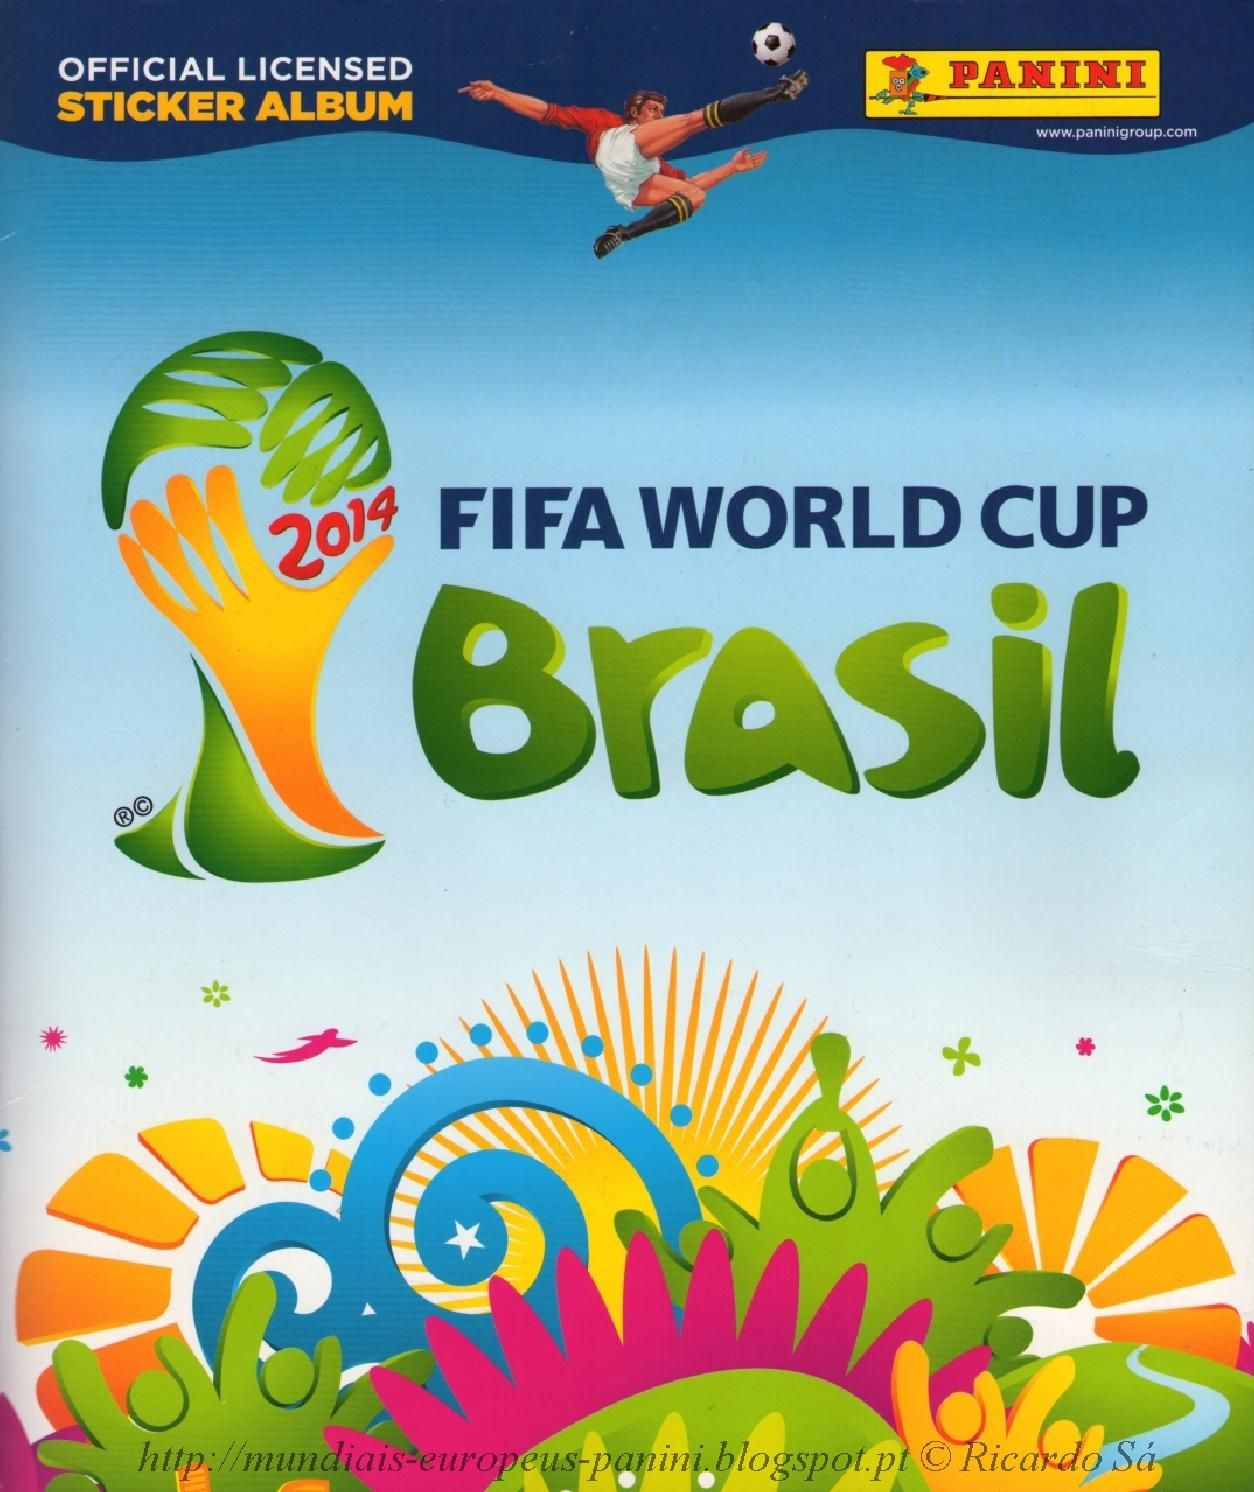 97a58b3d2 Panini Sticker, Trading Cards, Fifa 2014 World Cup, Brazil World Cup, World